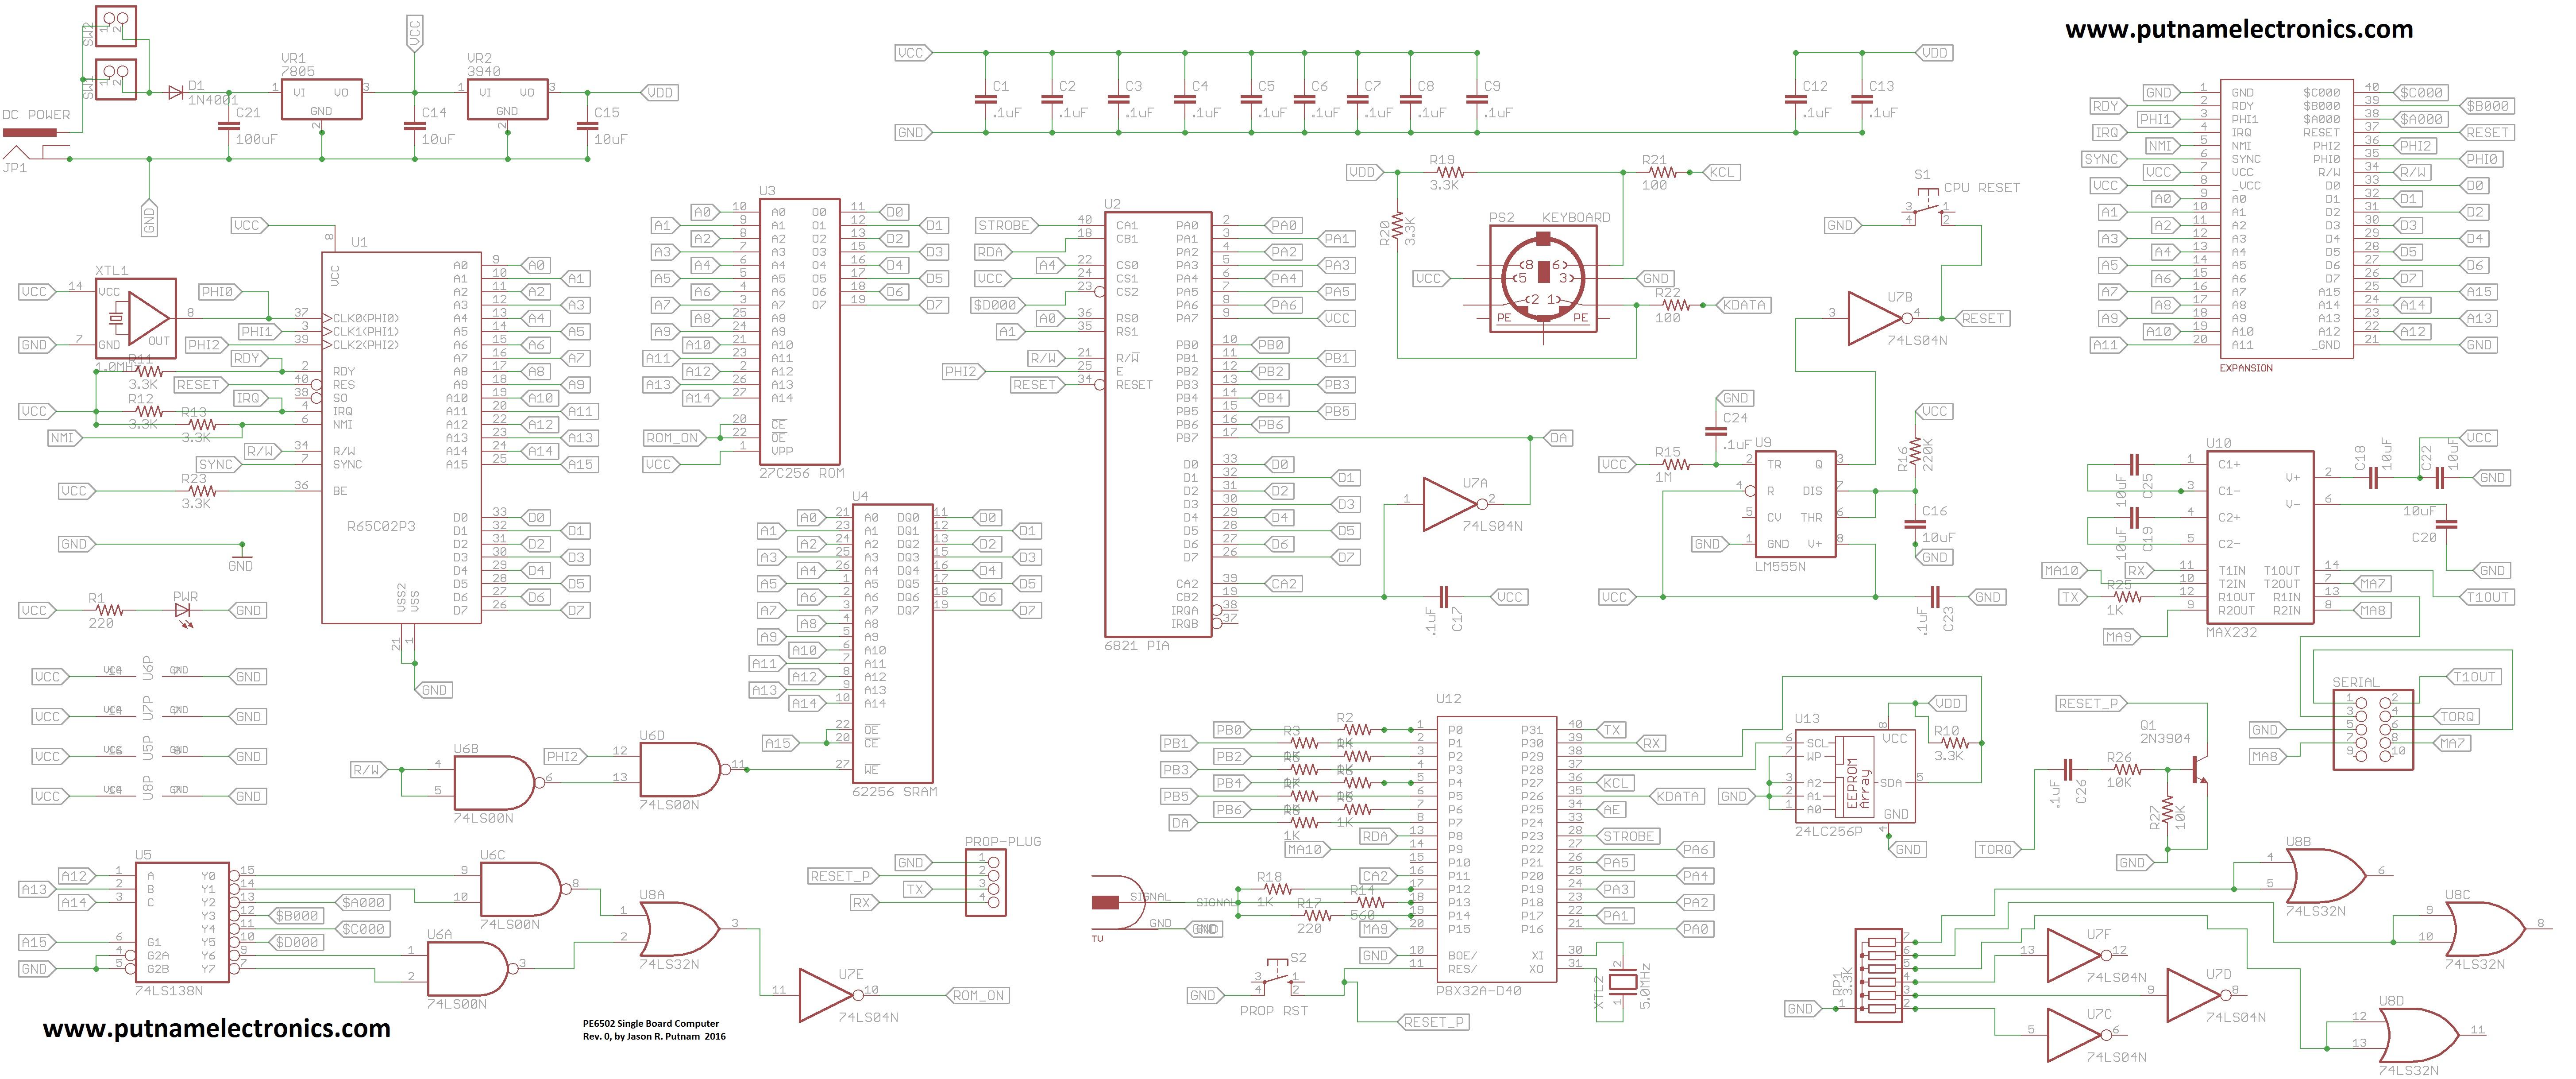 We Are Putnam Electronics